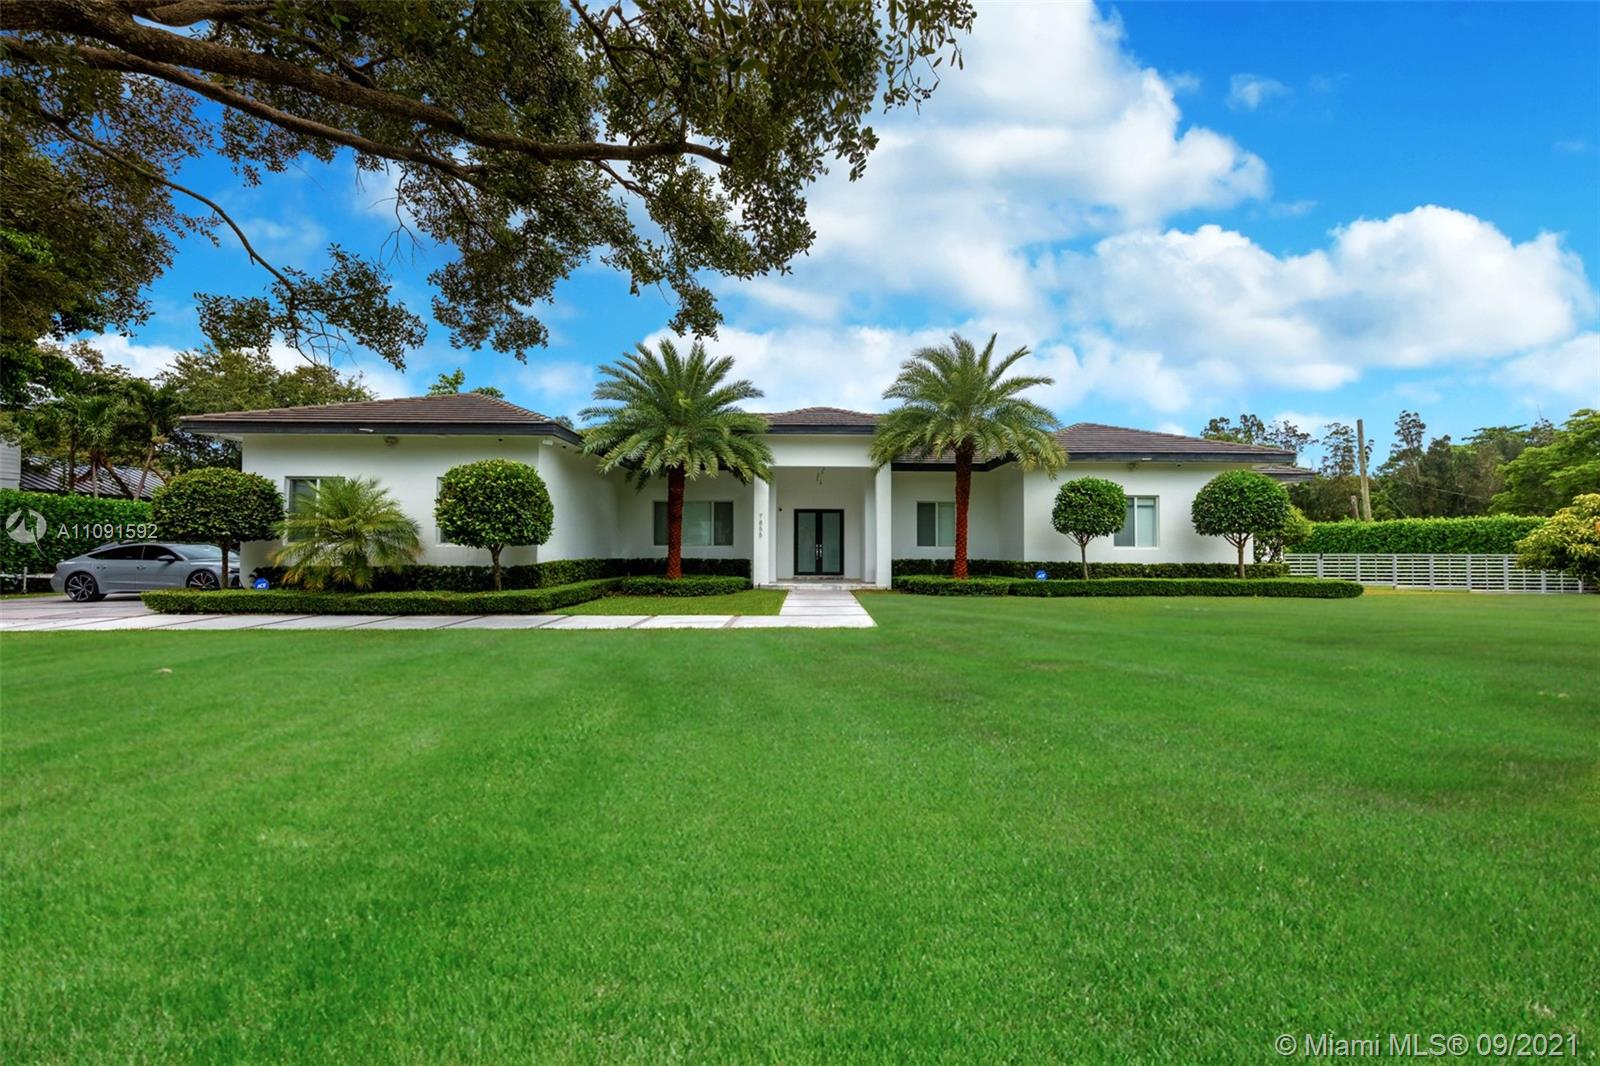 Pine Tree Estates - 7855 SW 129th Ter, Pinecrest, FL 33156